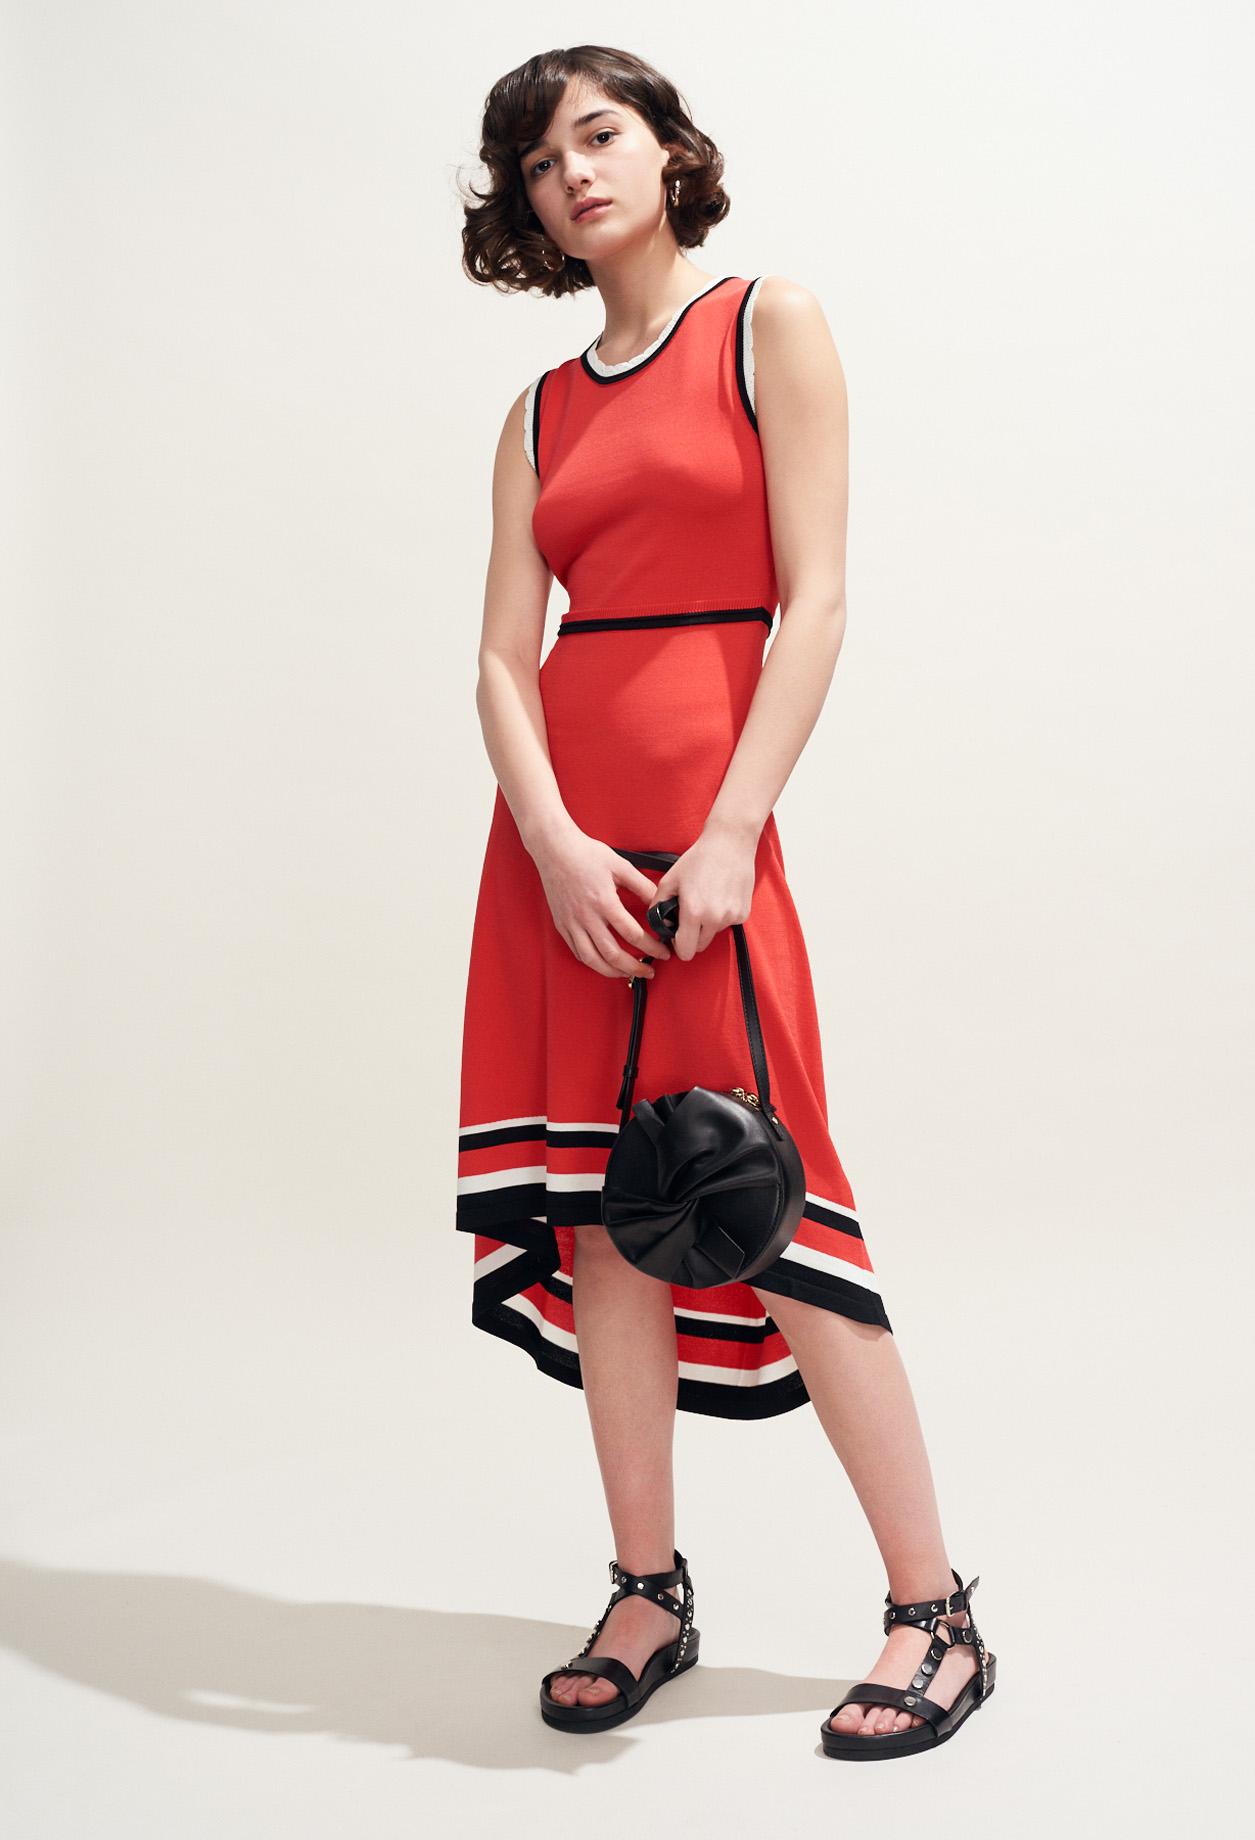 68eeca7904f MELISSE BIS   Dresses color ECARLATE